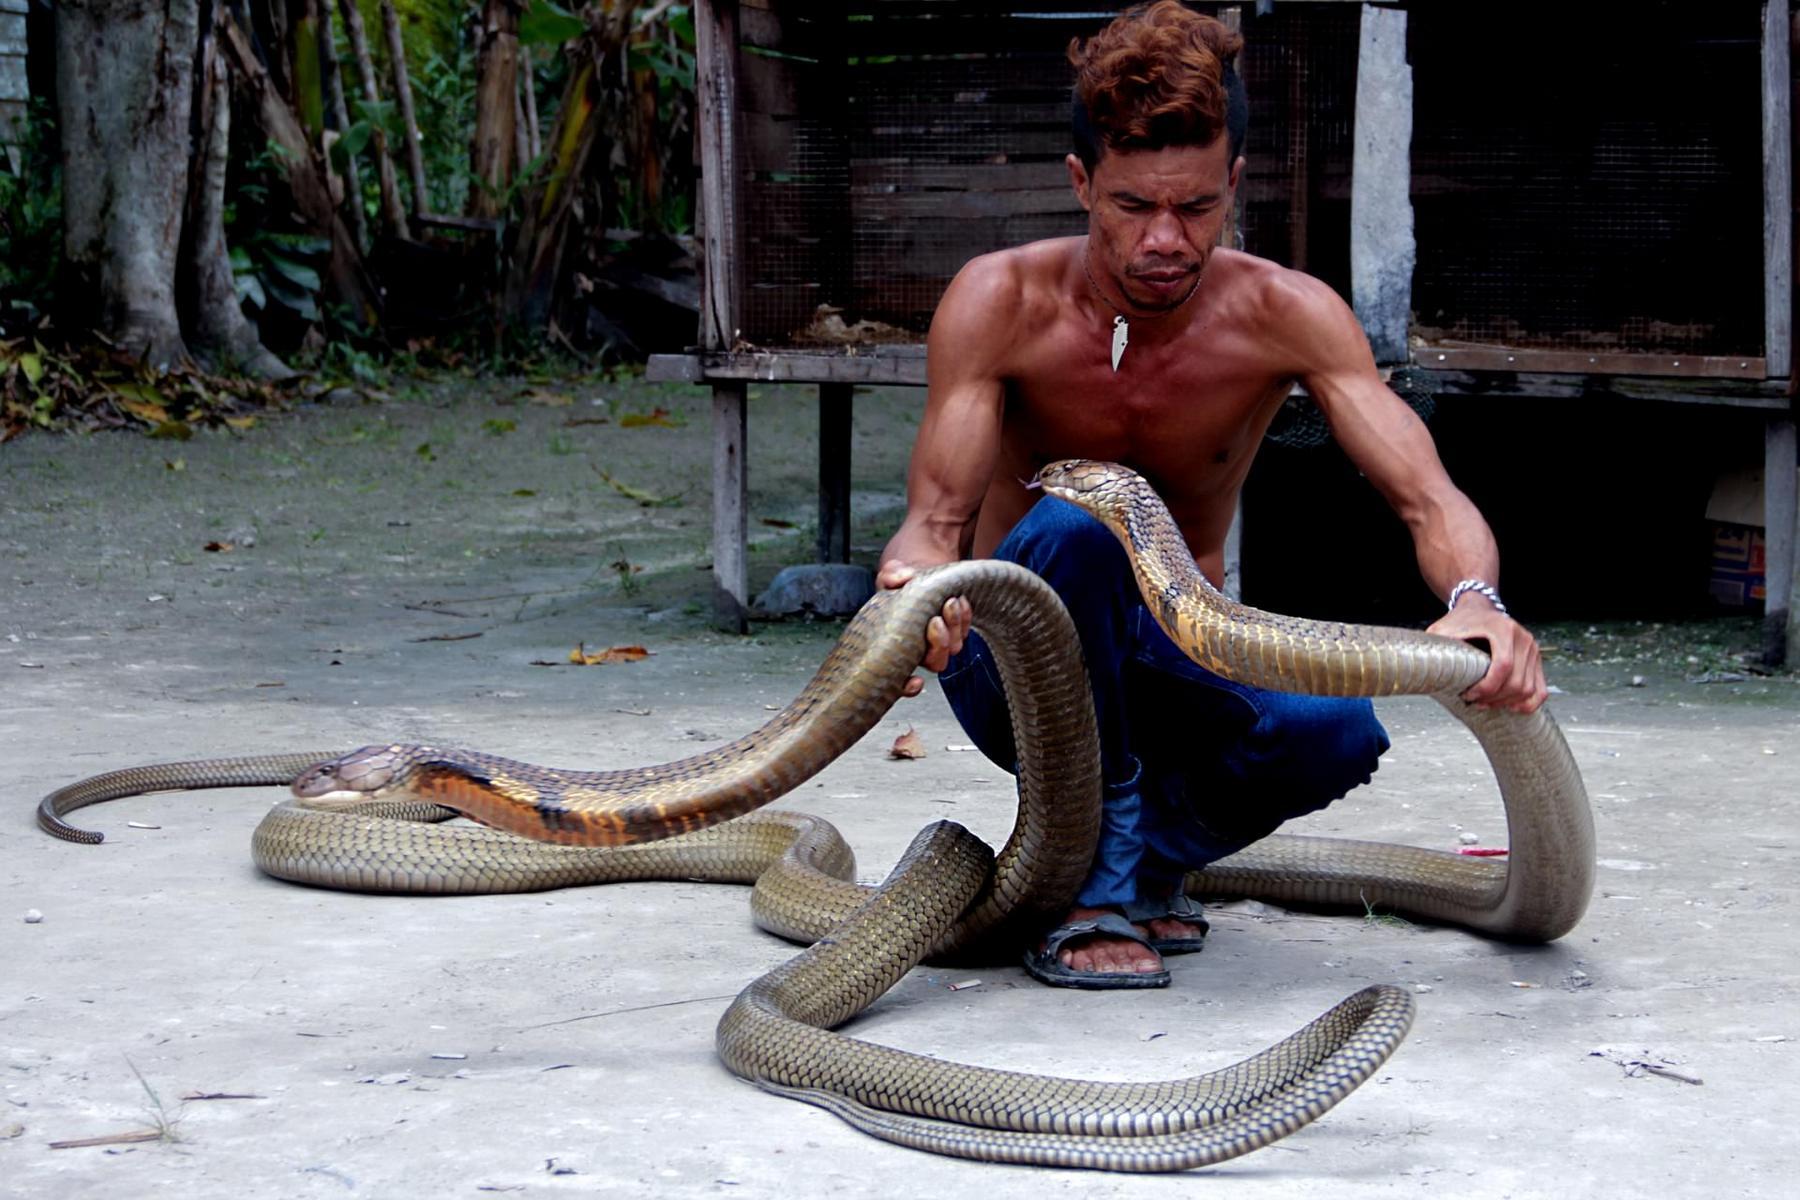 Страхование при укусе змеи